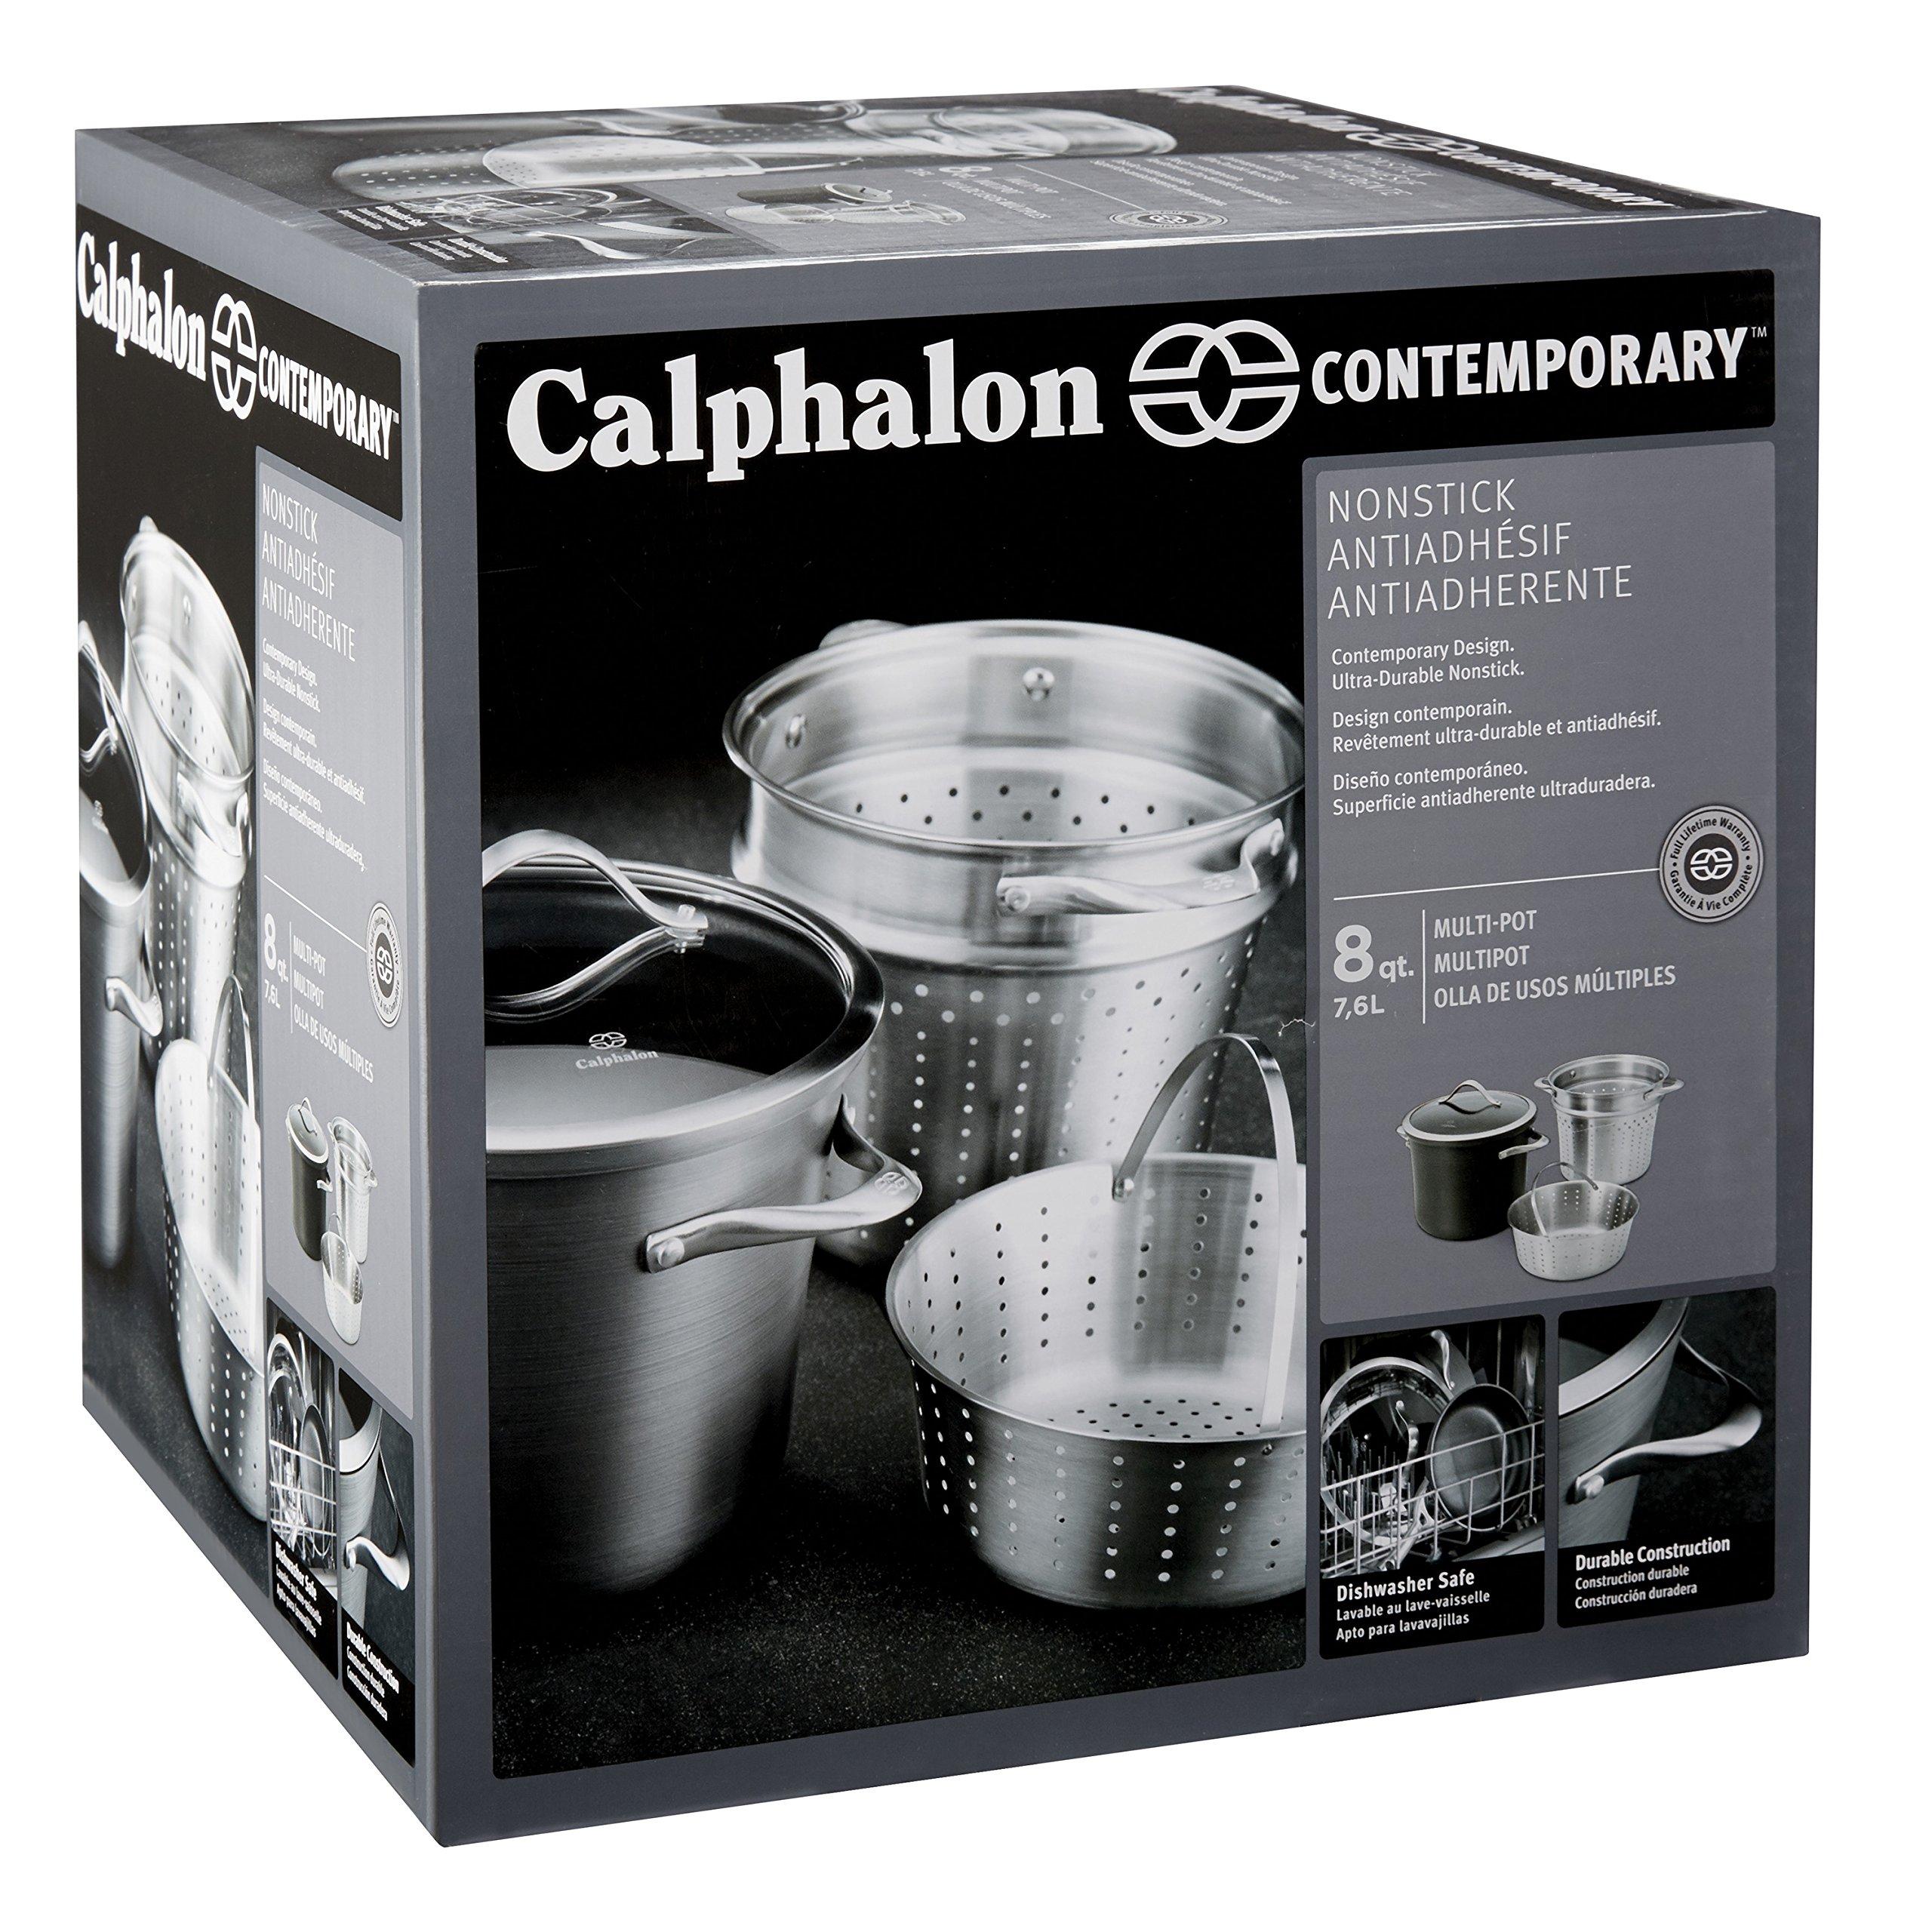 Calphalon Contemporary Hard-Anodized Aluminum Nonstick Cookware, Pasta Pot with Steamer Insert, 8-quart, Black by Calphalon (Image #5)